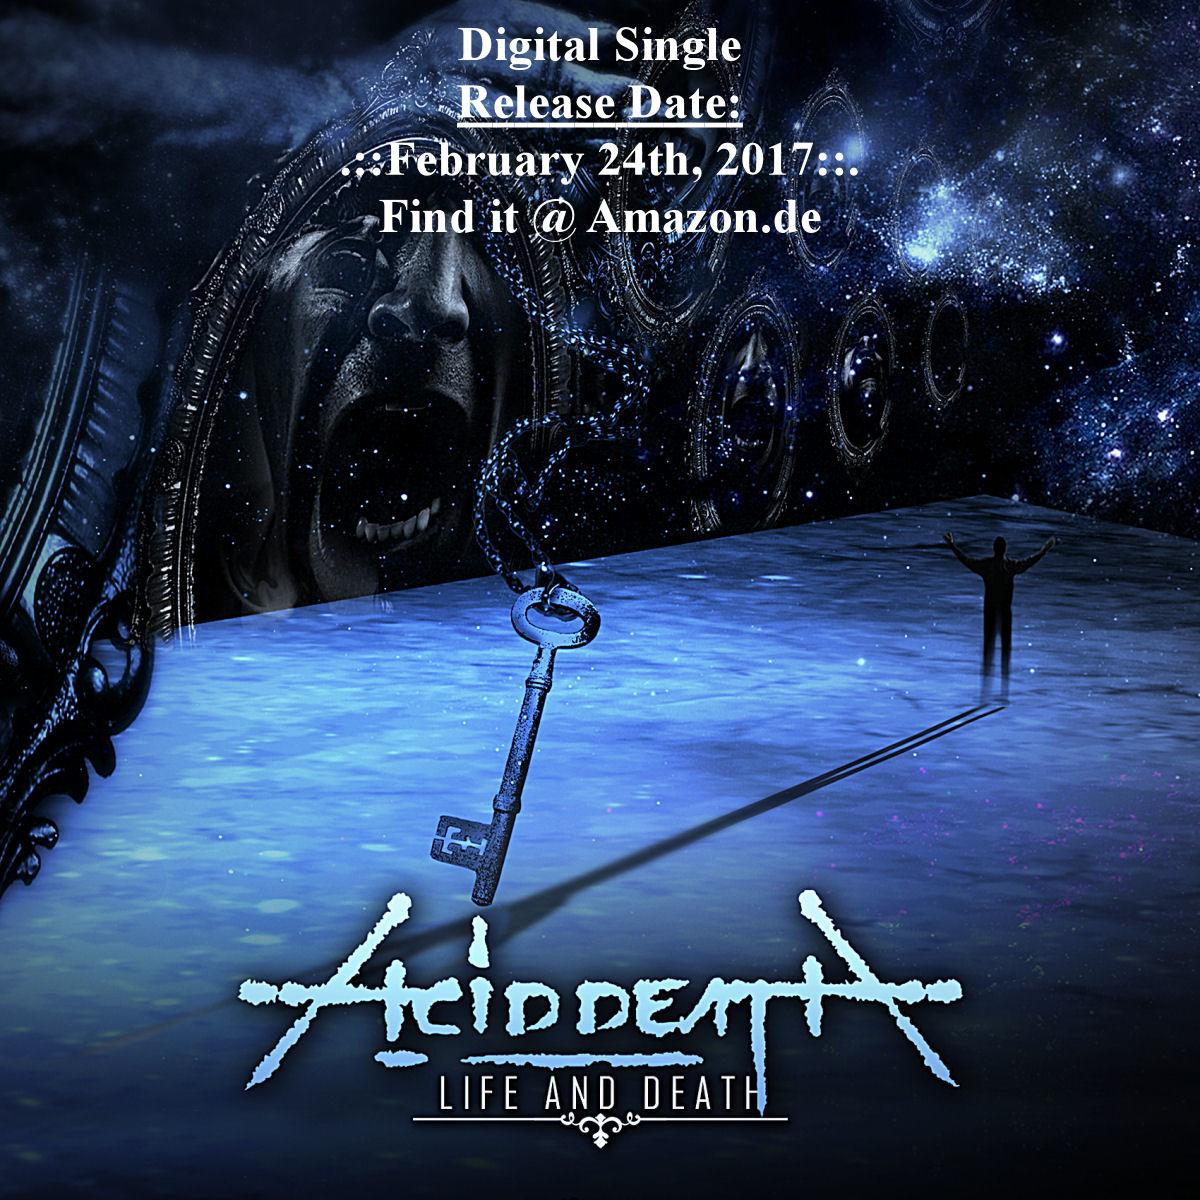 ACID DEATH - Life And Death feat. Jon Soti Digital Single 2017 amazon